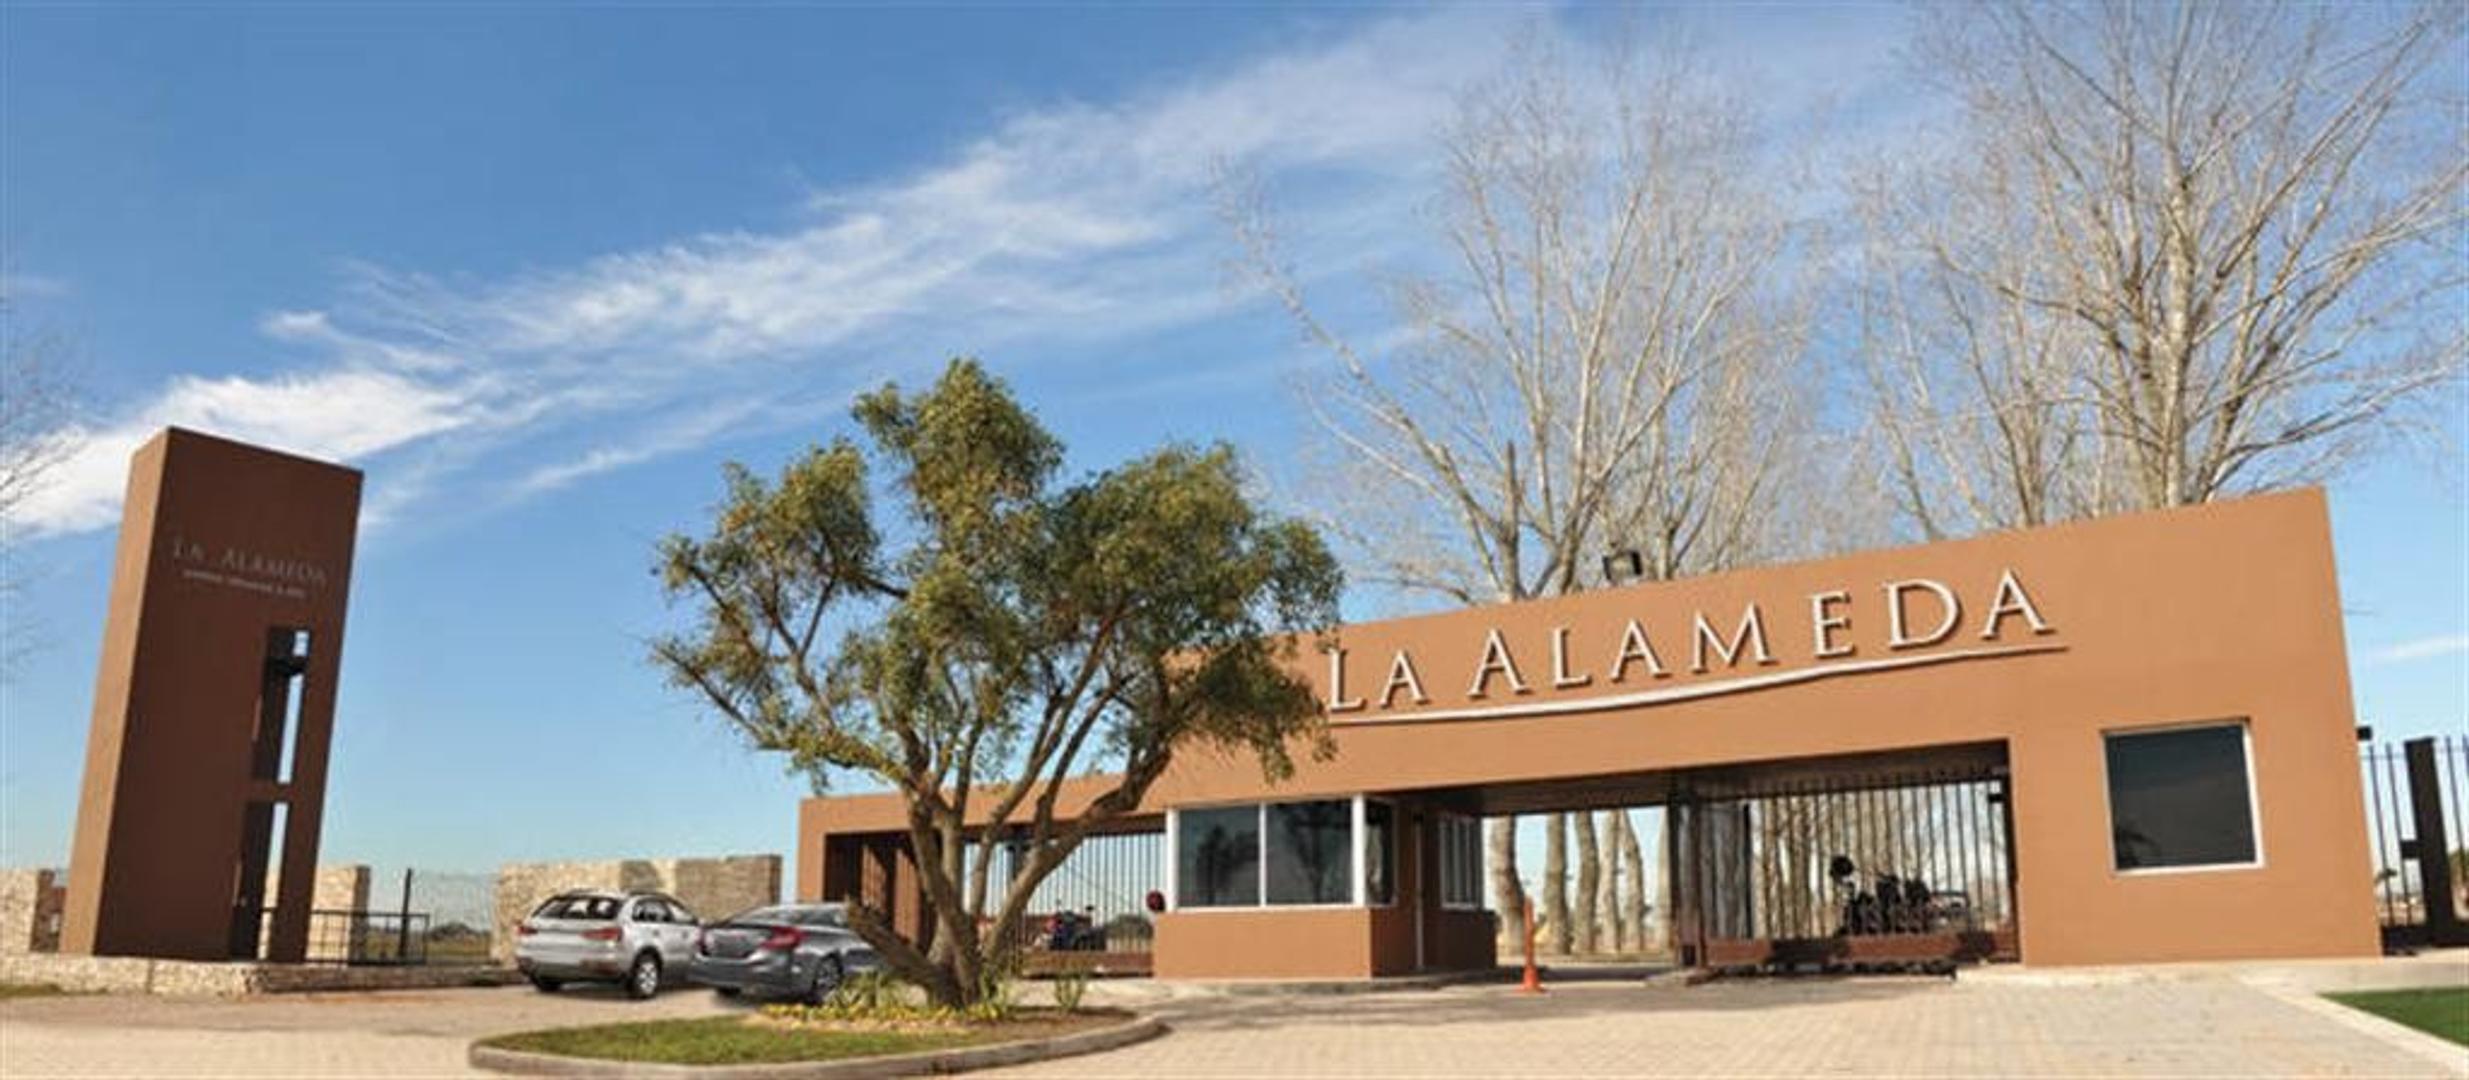 CANNING::LA ALAMEDA:BARRIO PRIVADO & SPA-LOTE ETAPA 1-POSESIÓN INMEDIATA